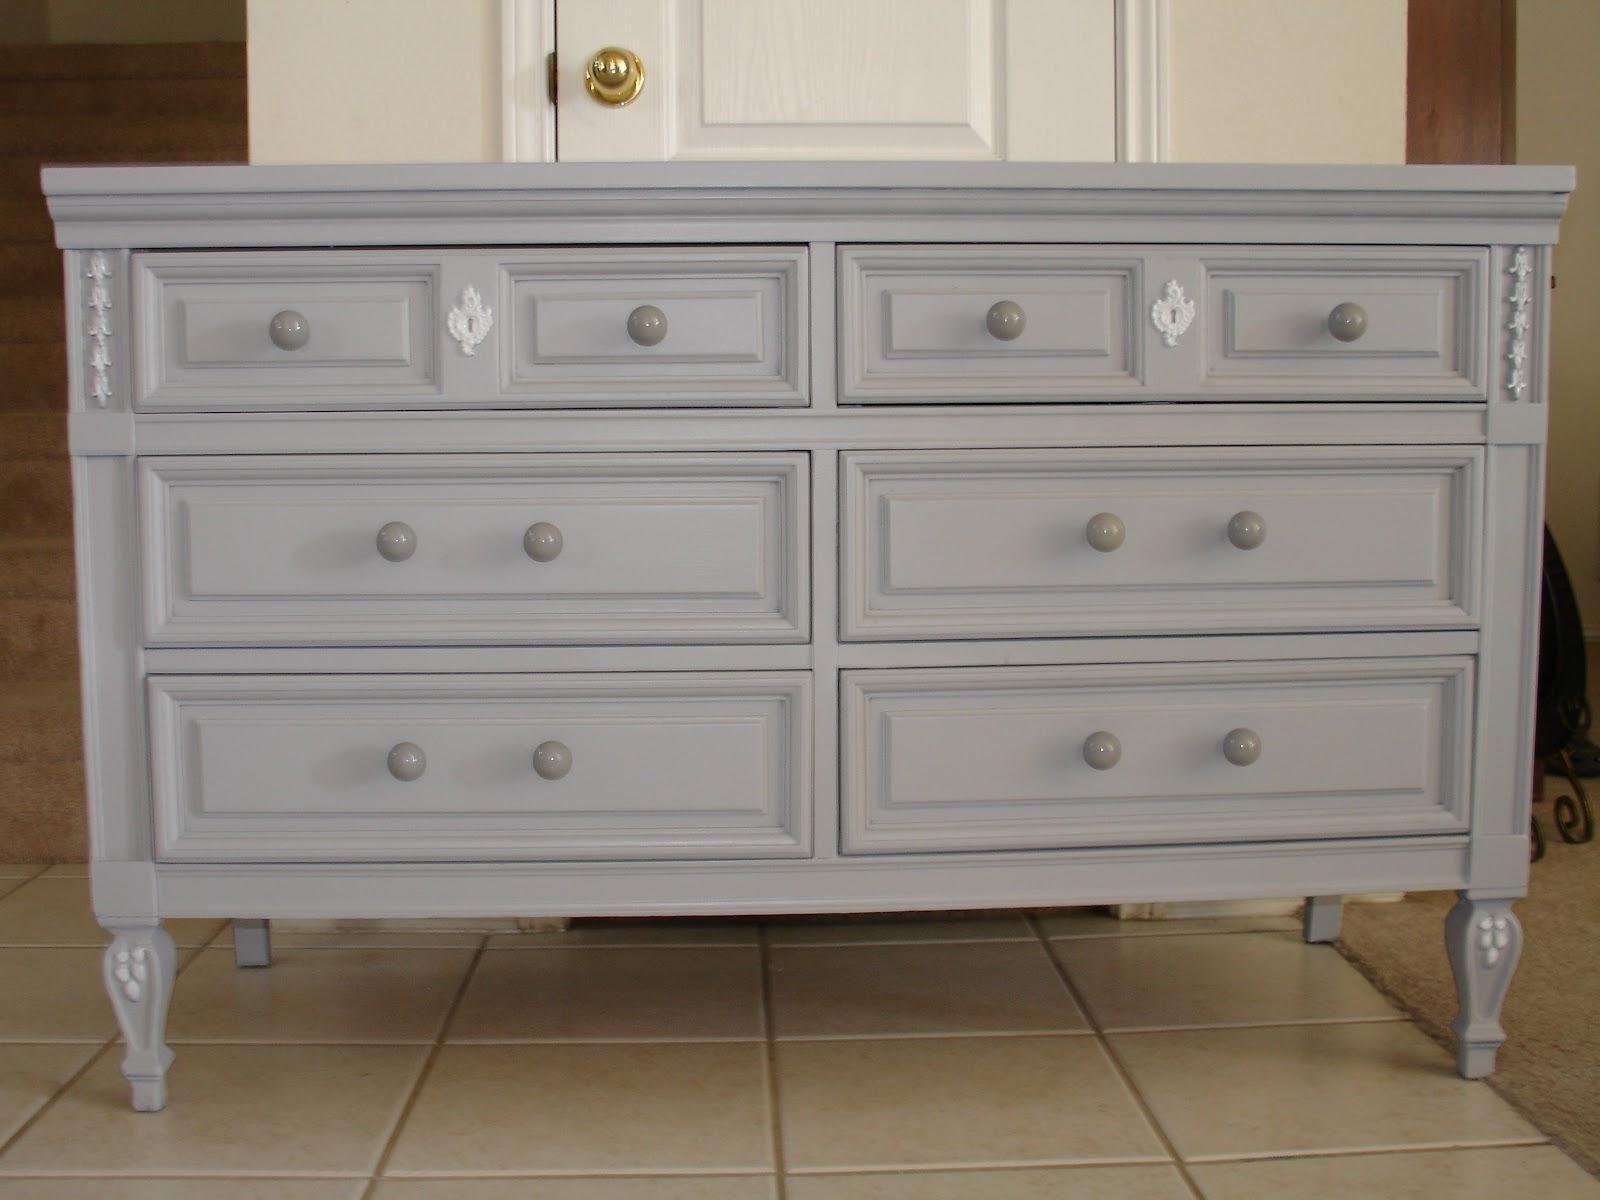 40 Stunning Grey Bedroom Furniture Ideas Designs And Styles Interiorsherpa Grey Bedroom Furniture Grey Dresser Dresser Decor Bedroom [ 1200 x 1600 Pixel ]